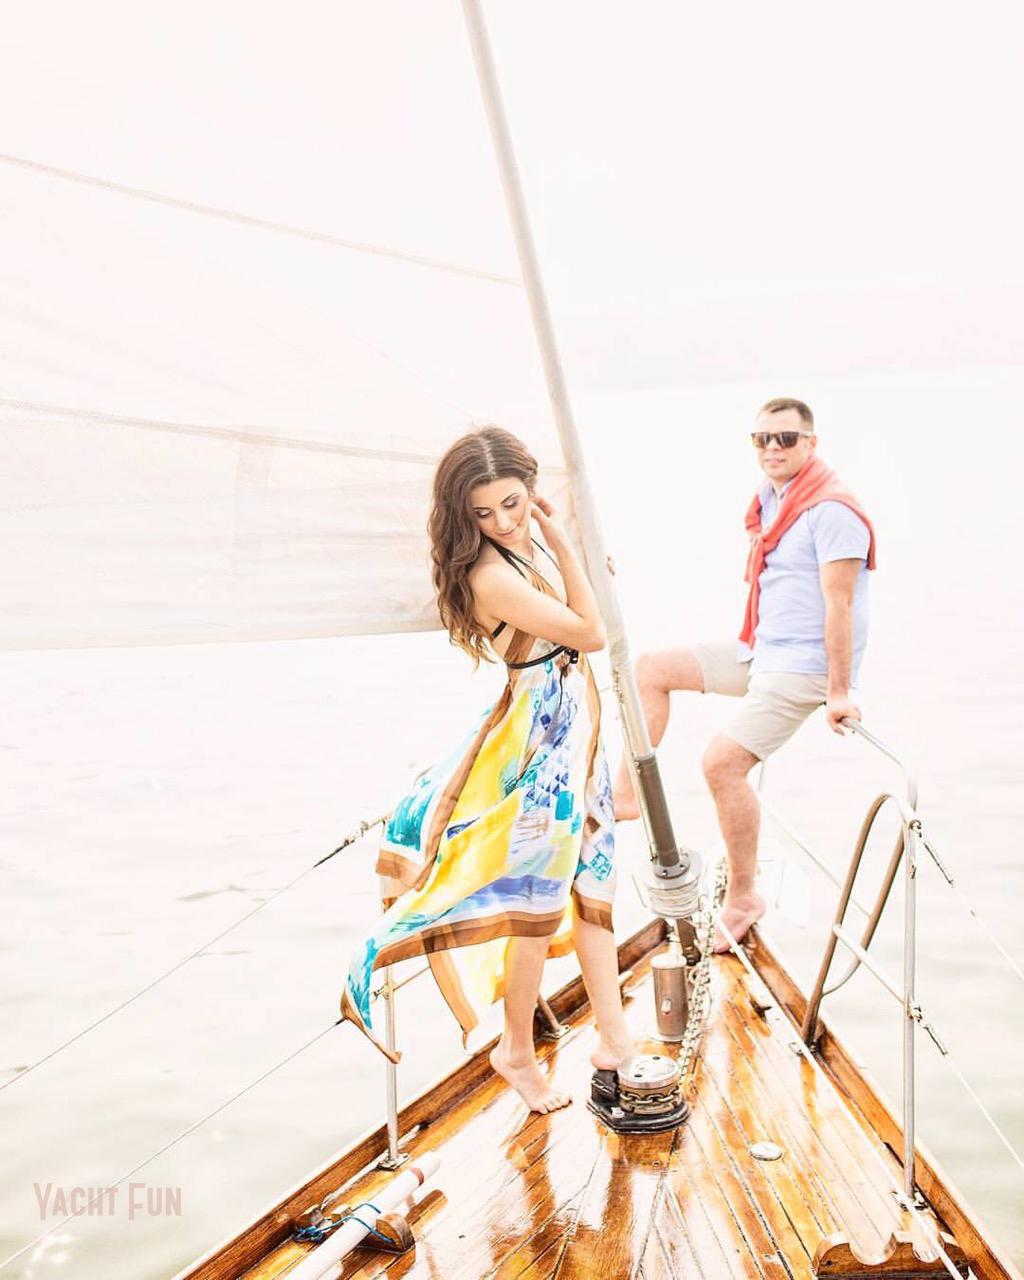 Лавстори на яхте Yacht Fun (5)